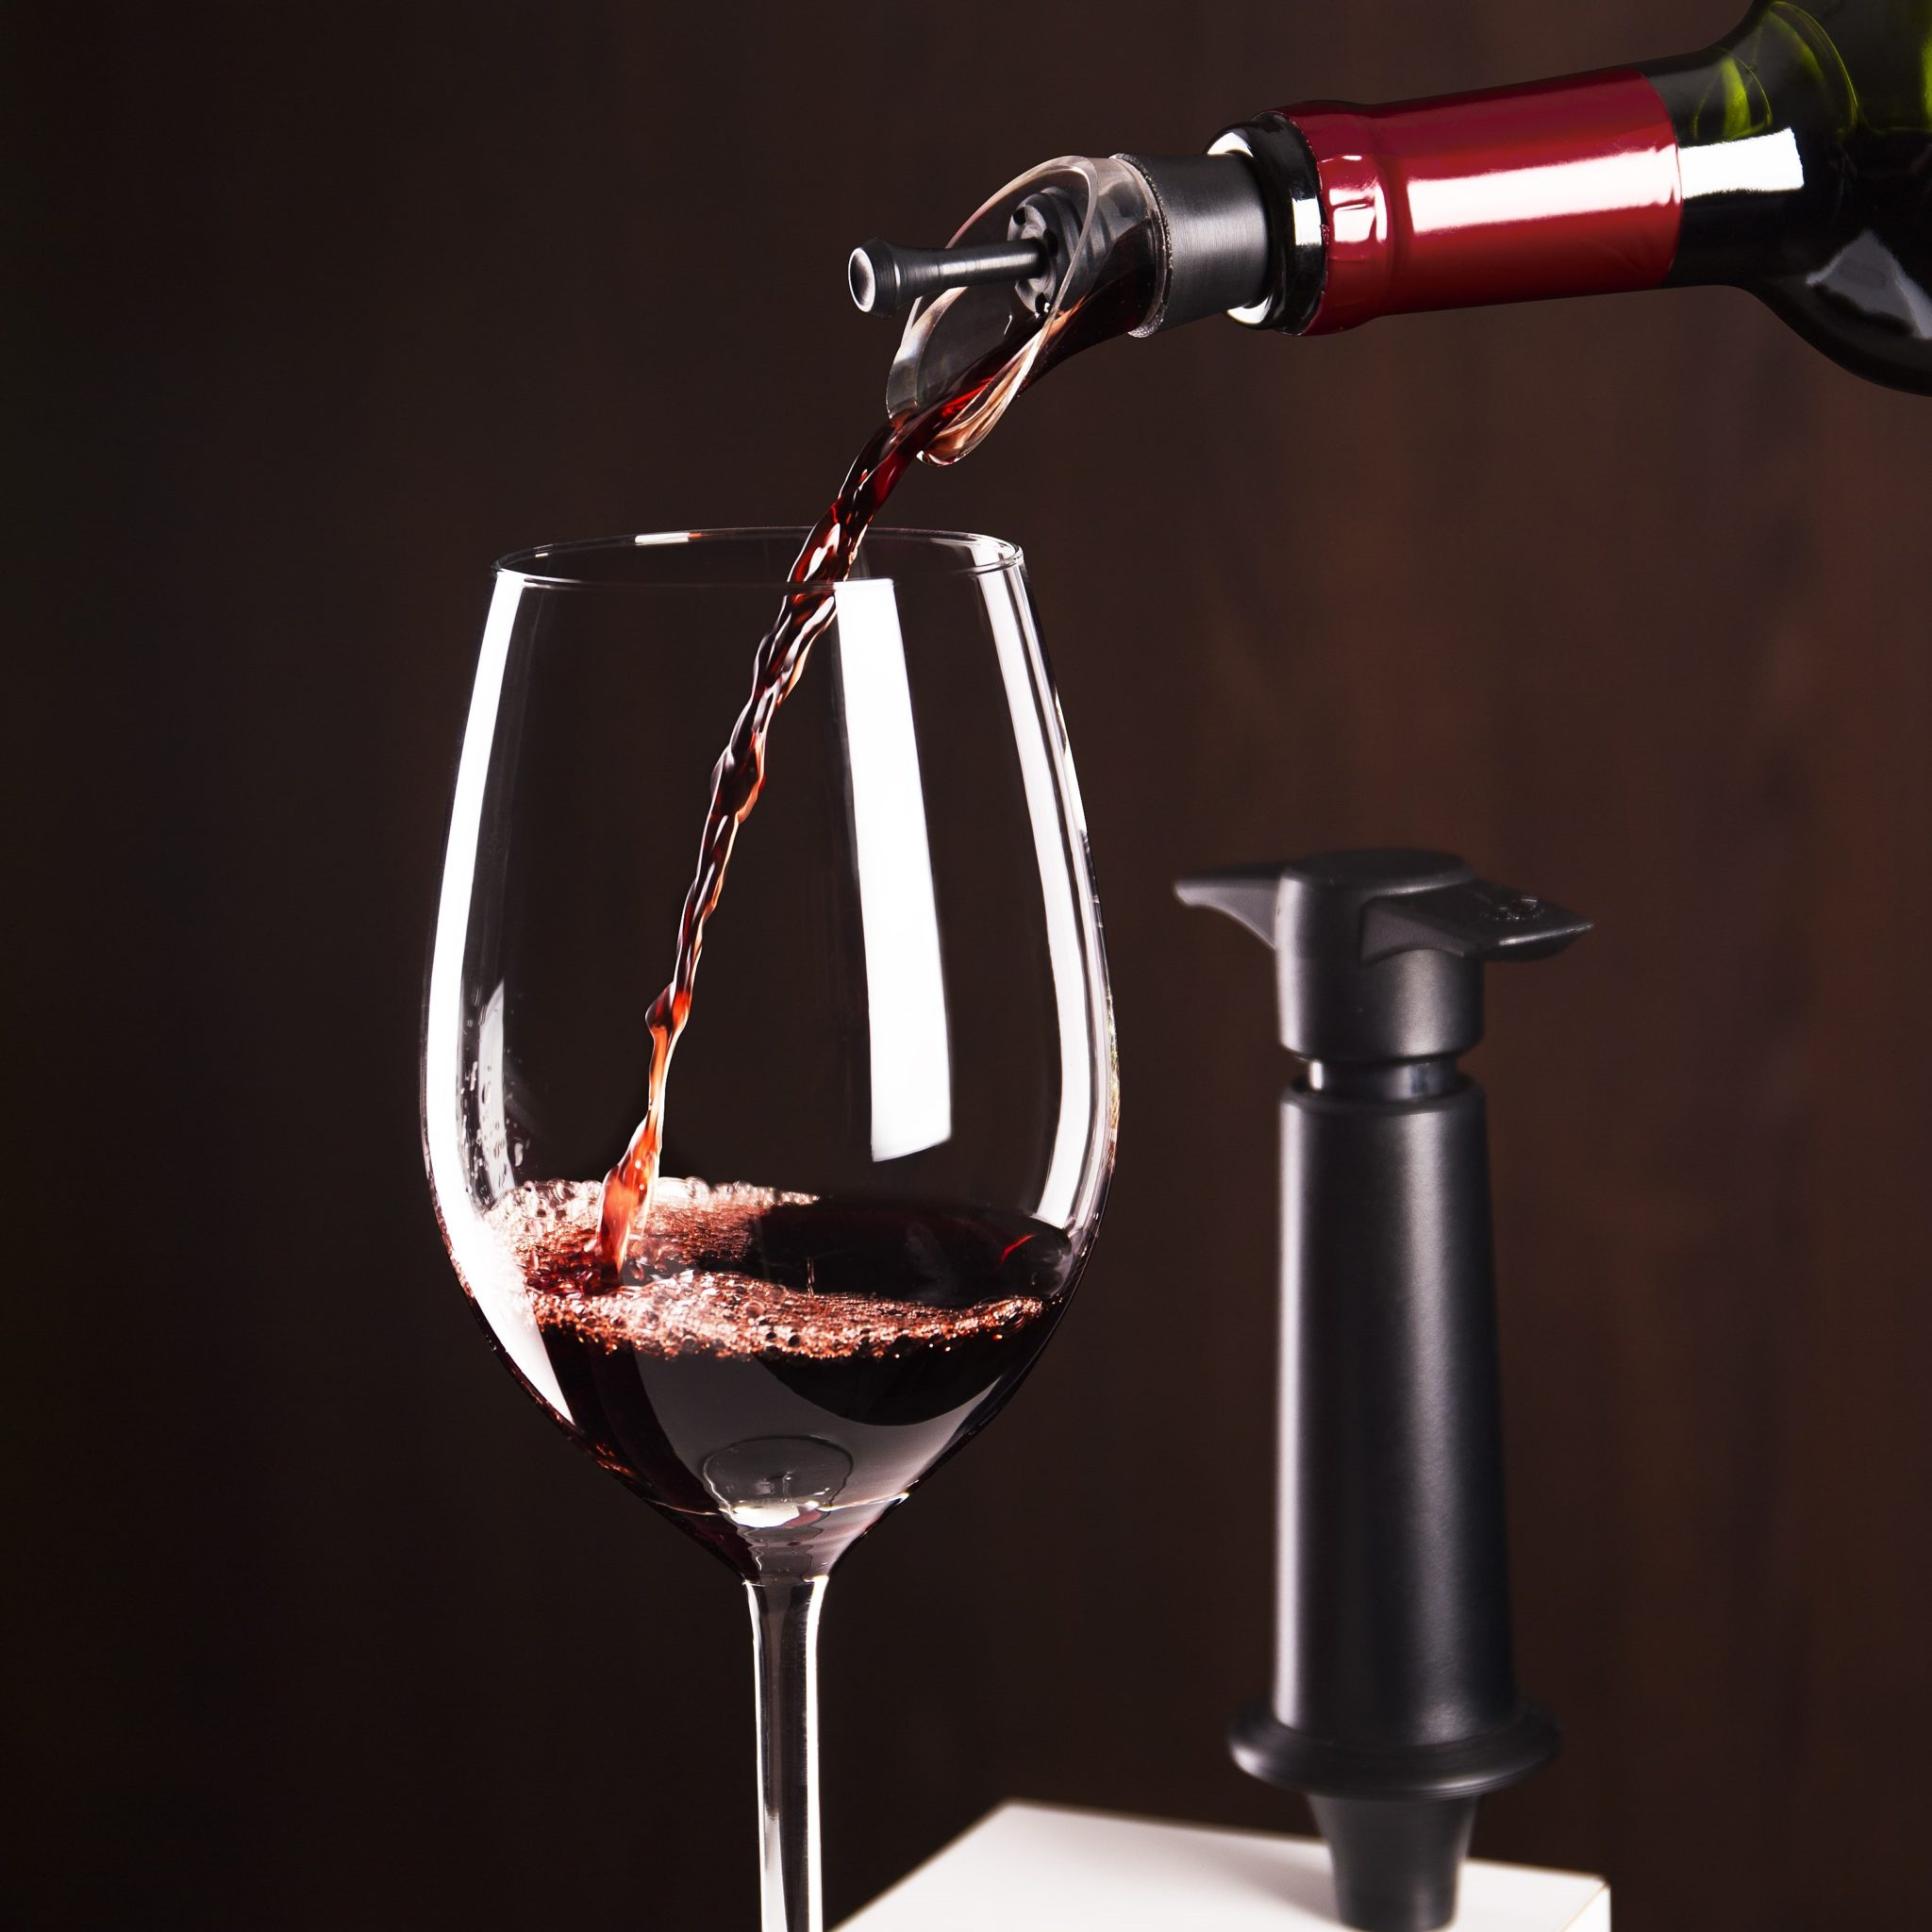 Wine academy part 4: cost of wine